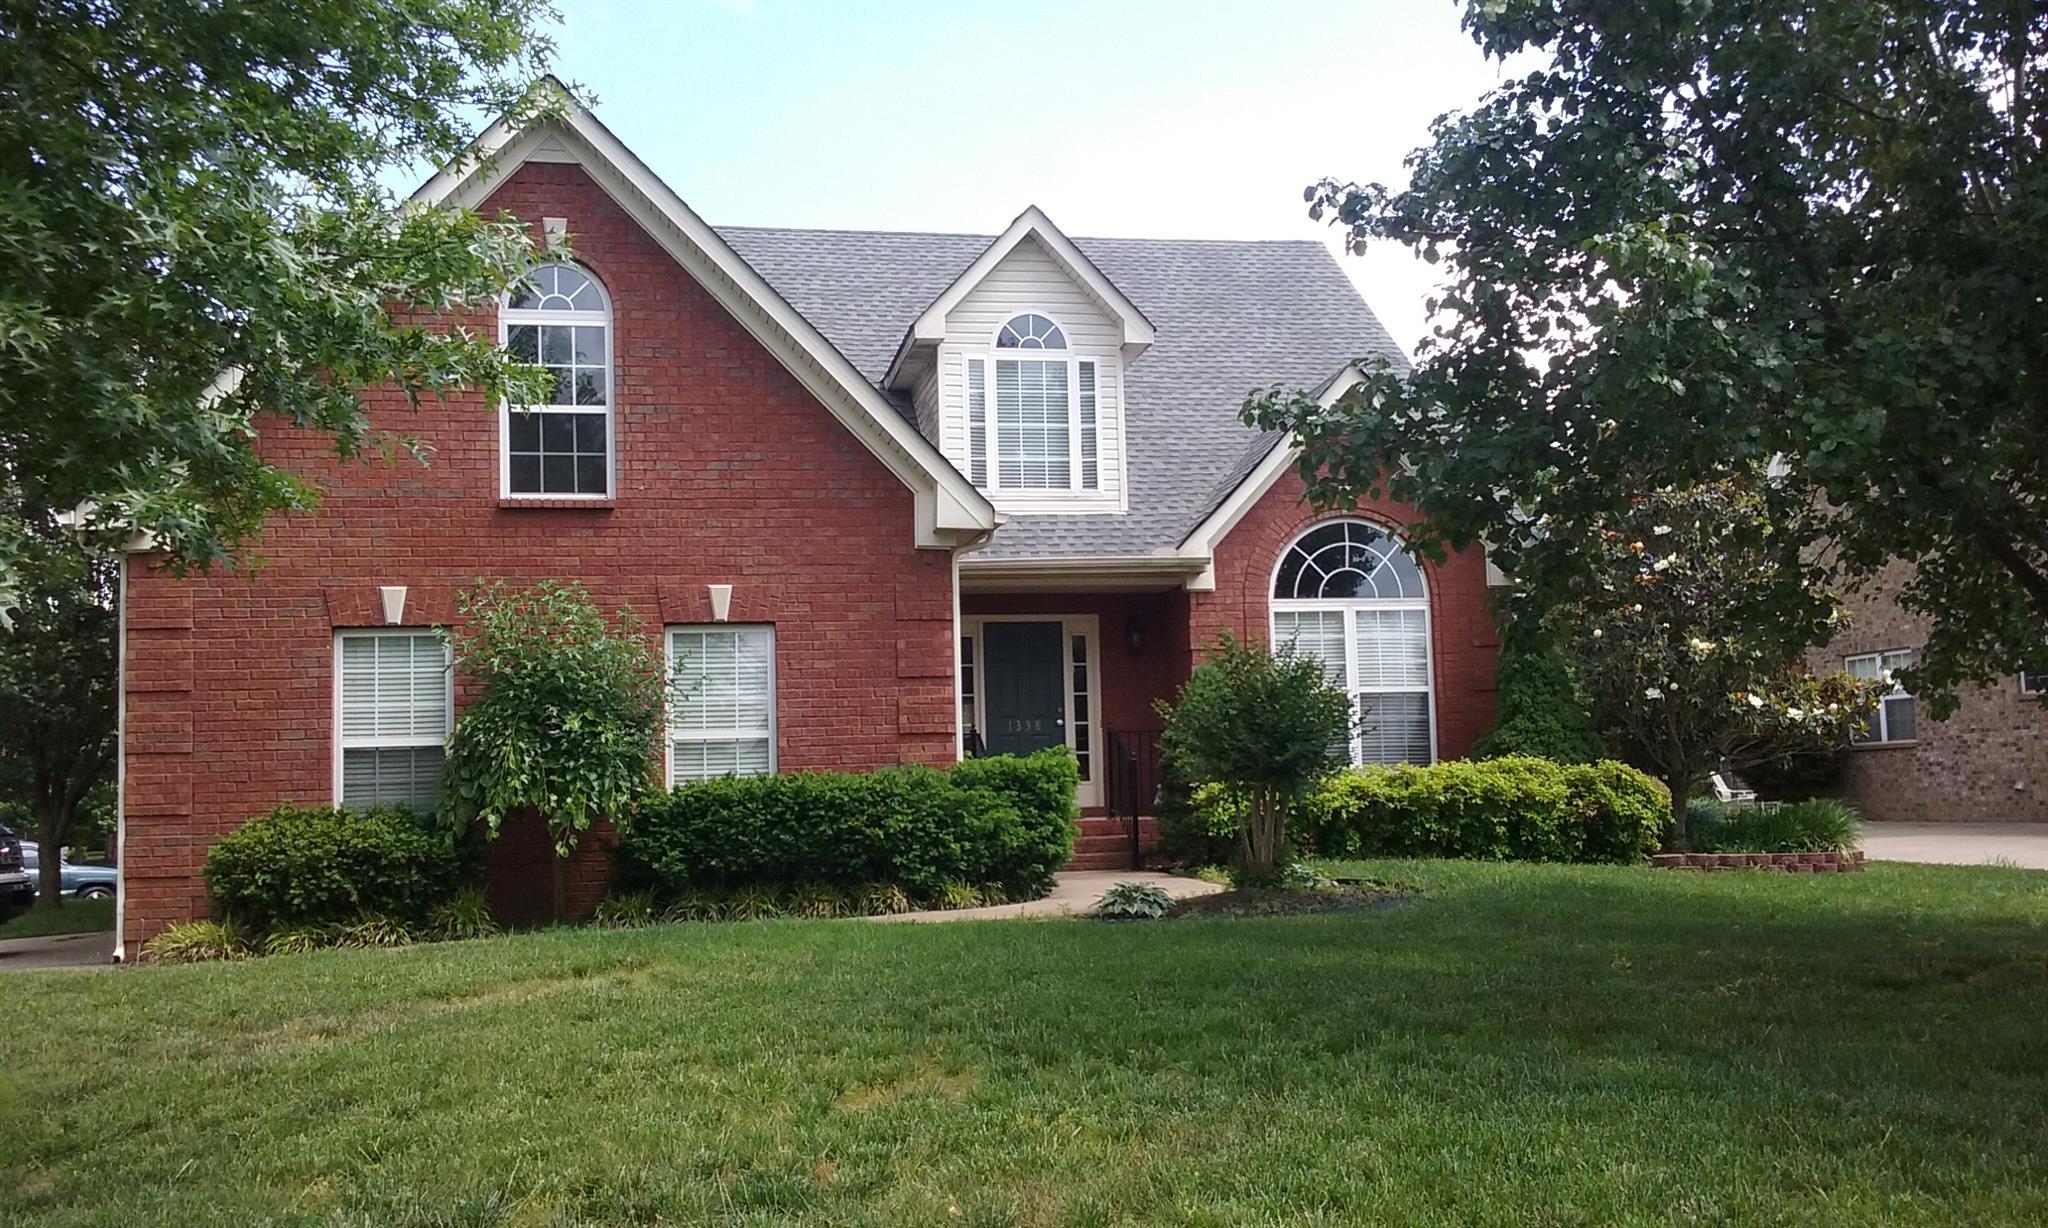 1338 Balson Dr, Murfreesboro, TN 37128